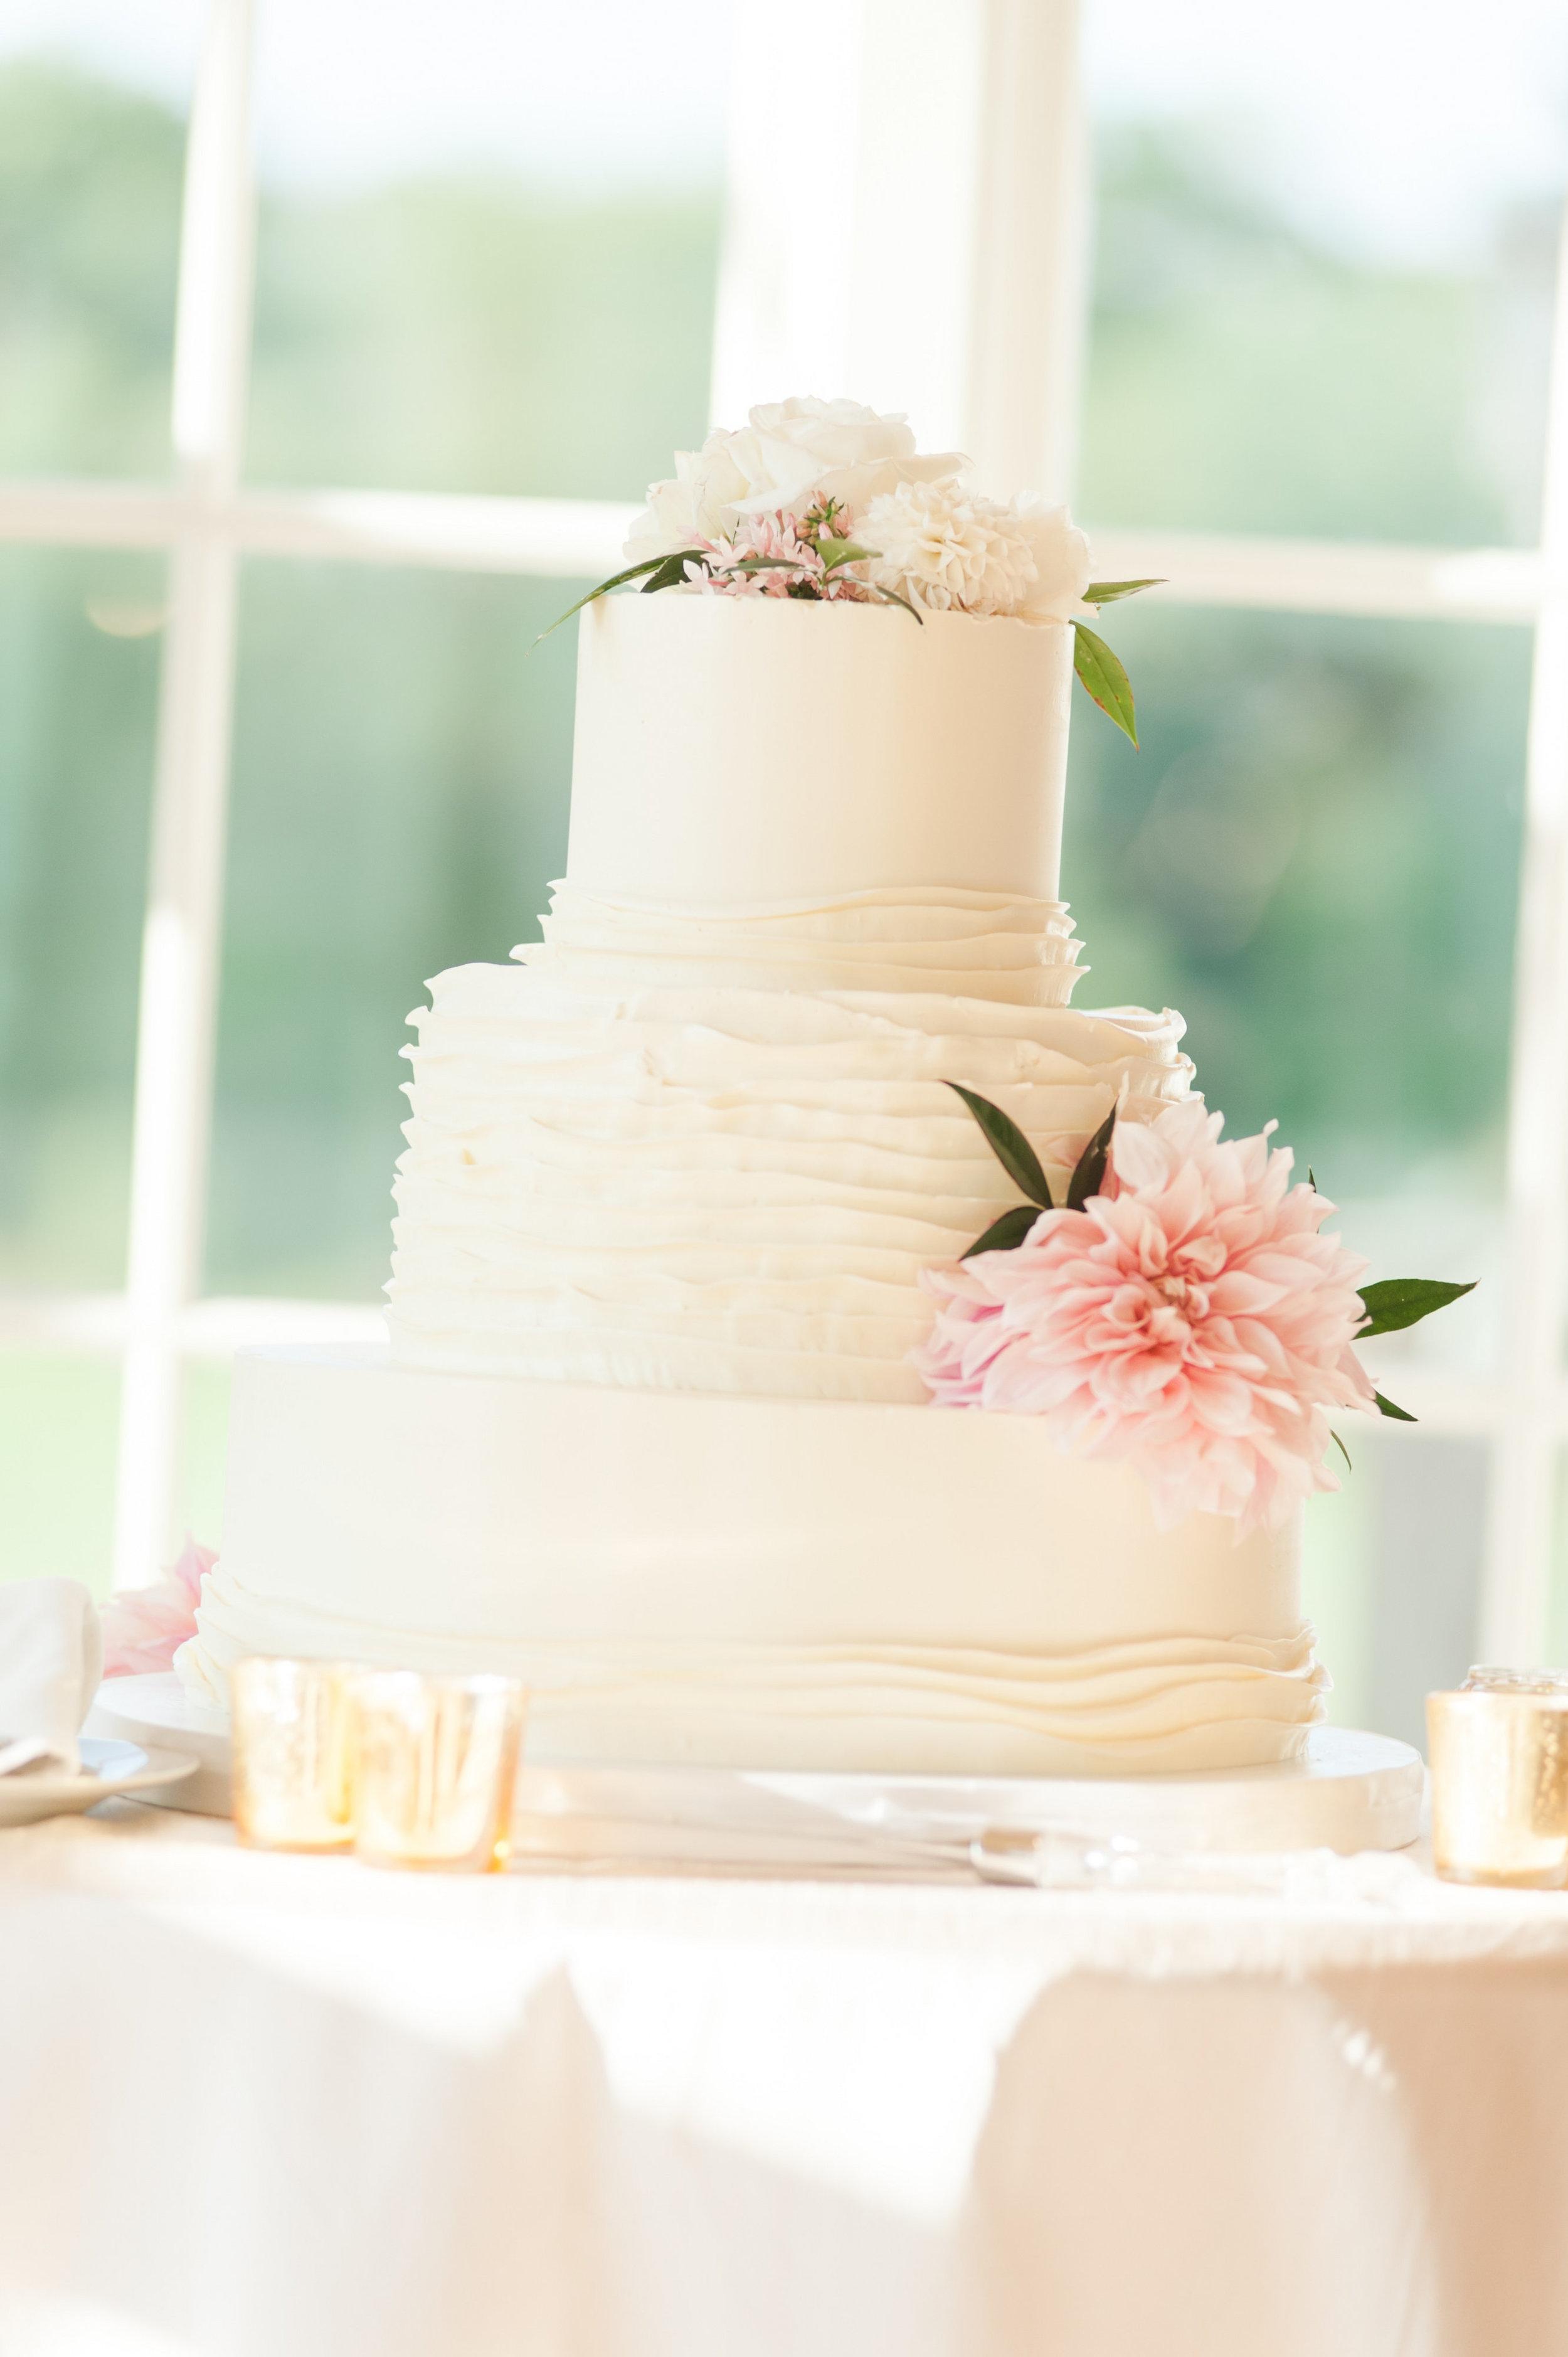 MORAIS VINEYARDS WEDDING JOFFOTO FAVORITE-JOFFOTO FAVORITE-0208.jpg